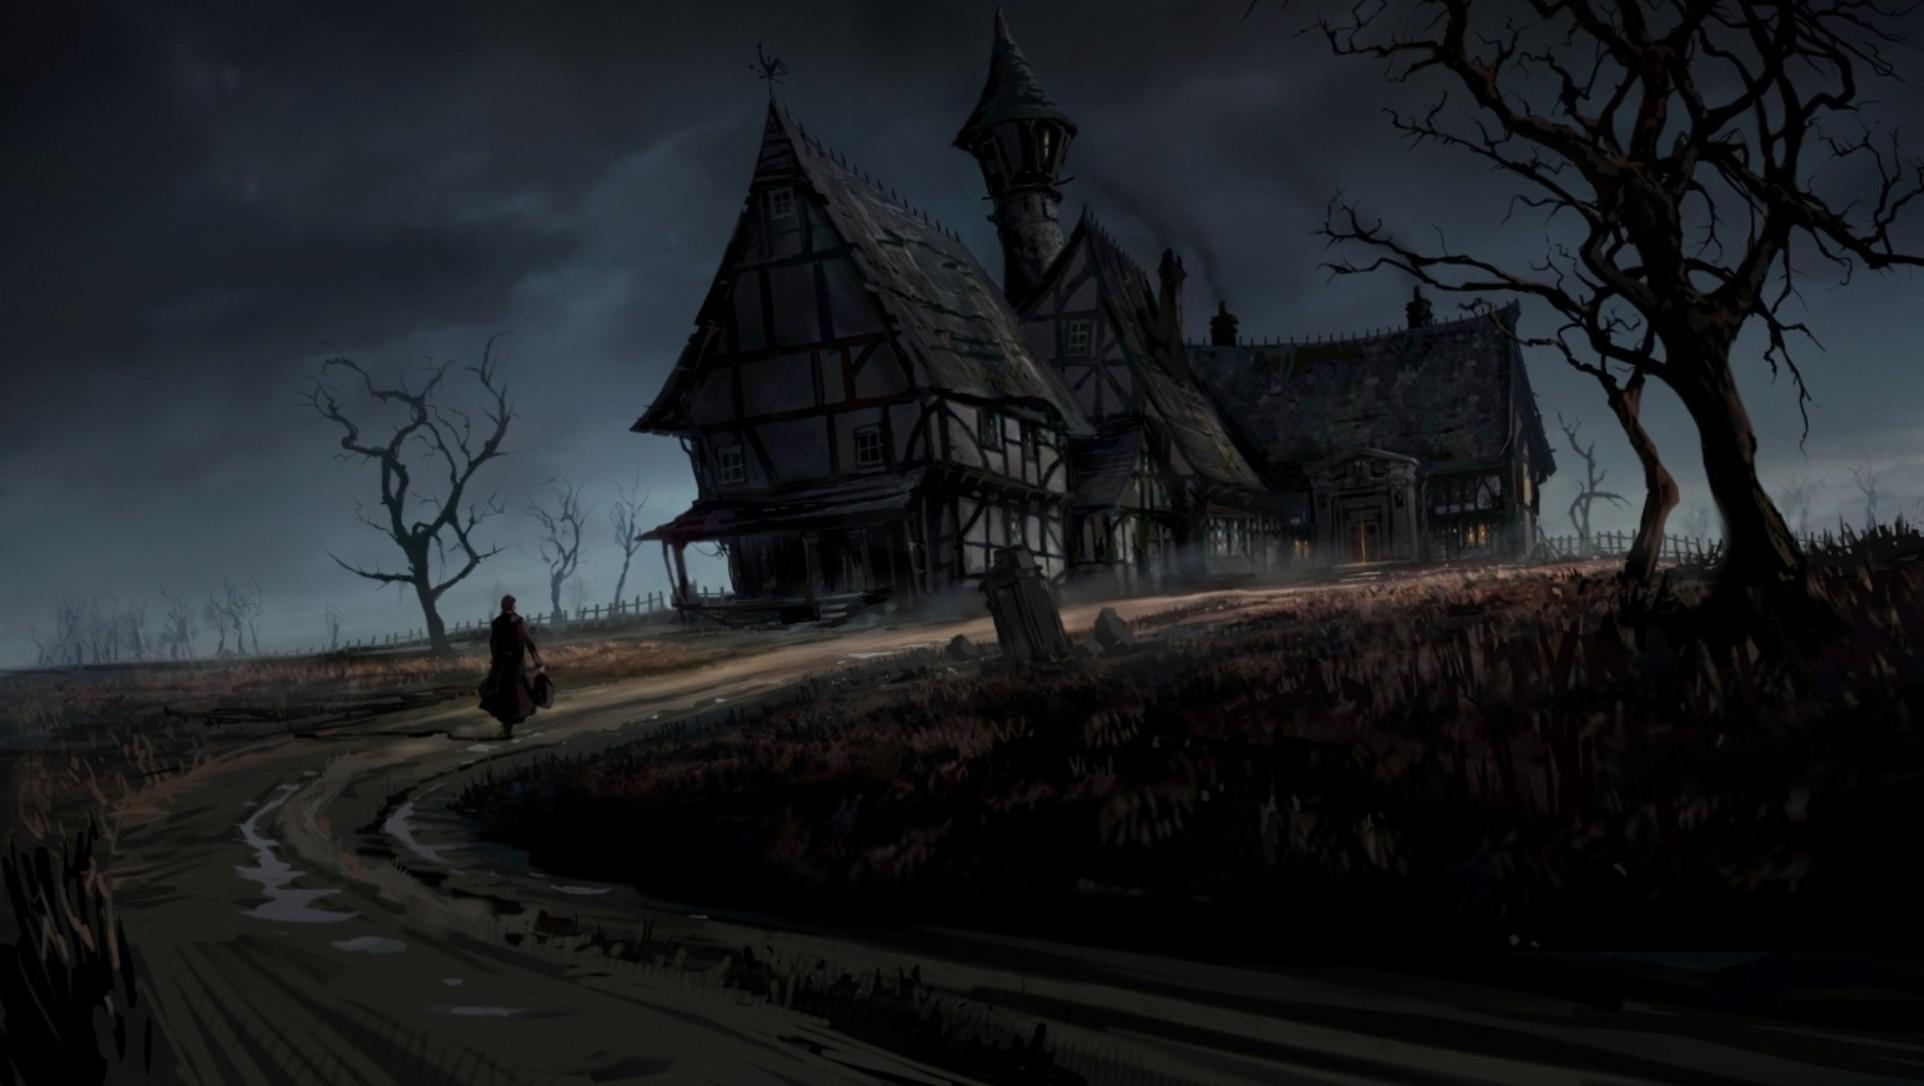 Dark fantasy wallpaper 79 images - Fantasy background ...